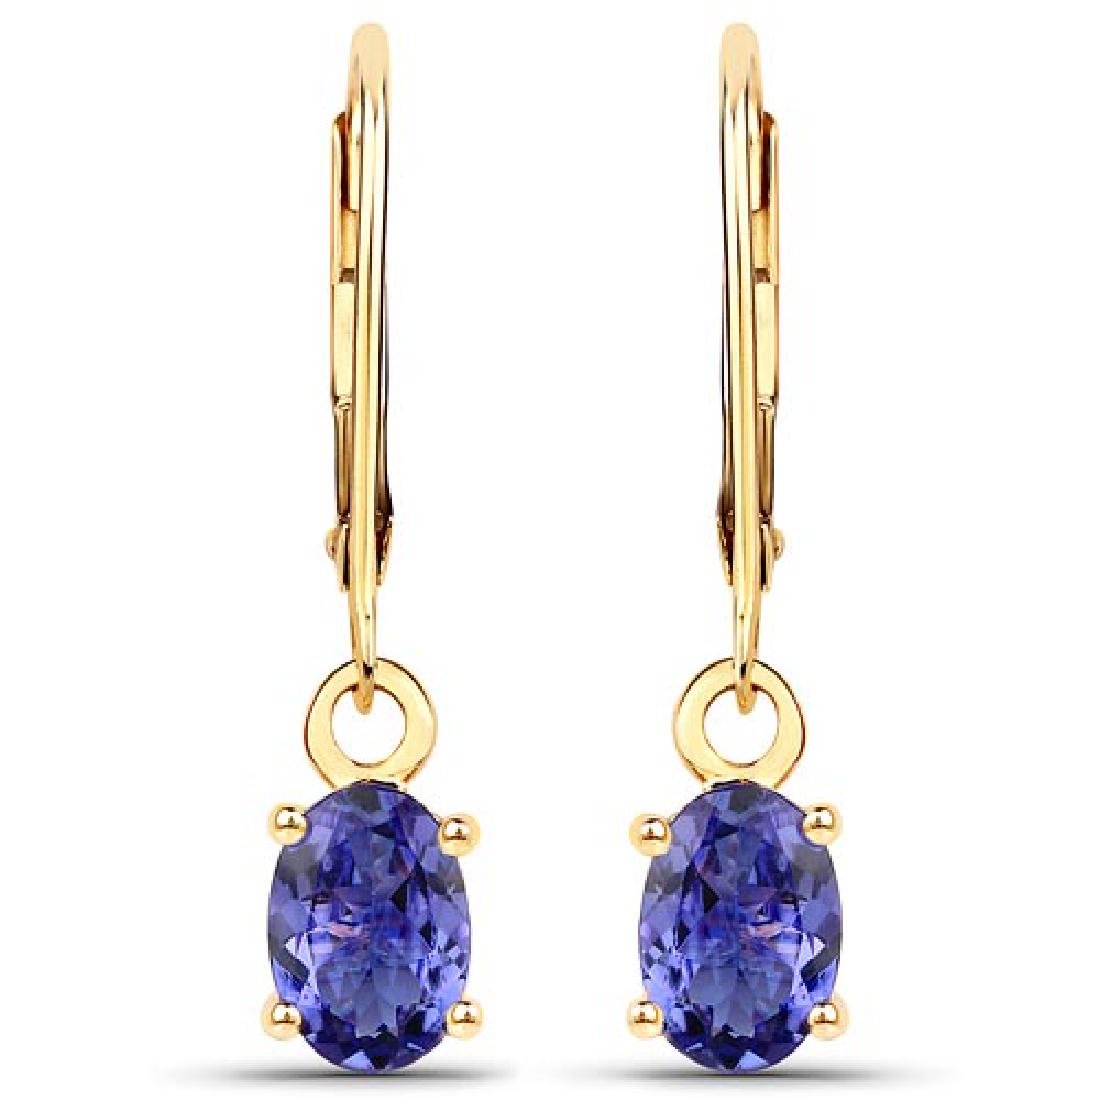 1.50 CTW Genuine Tanzanite 14K Yellow Gold Earrings